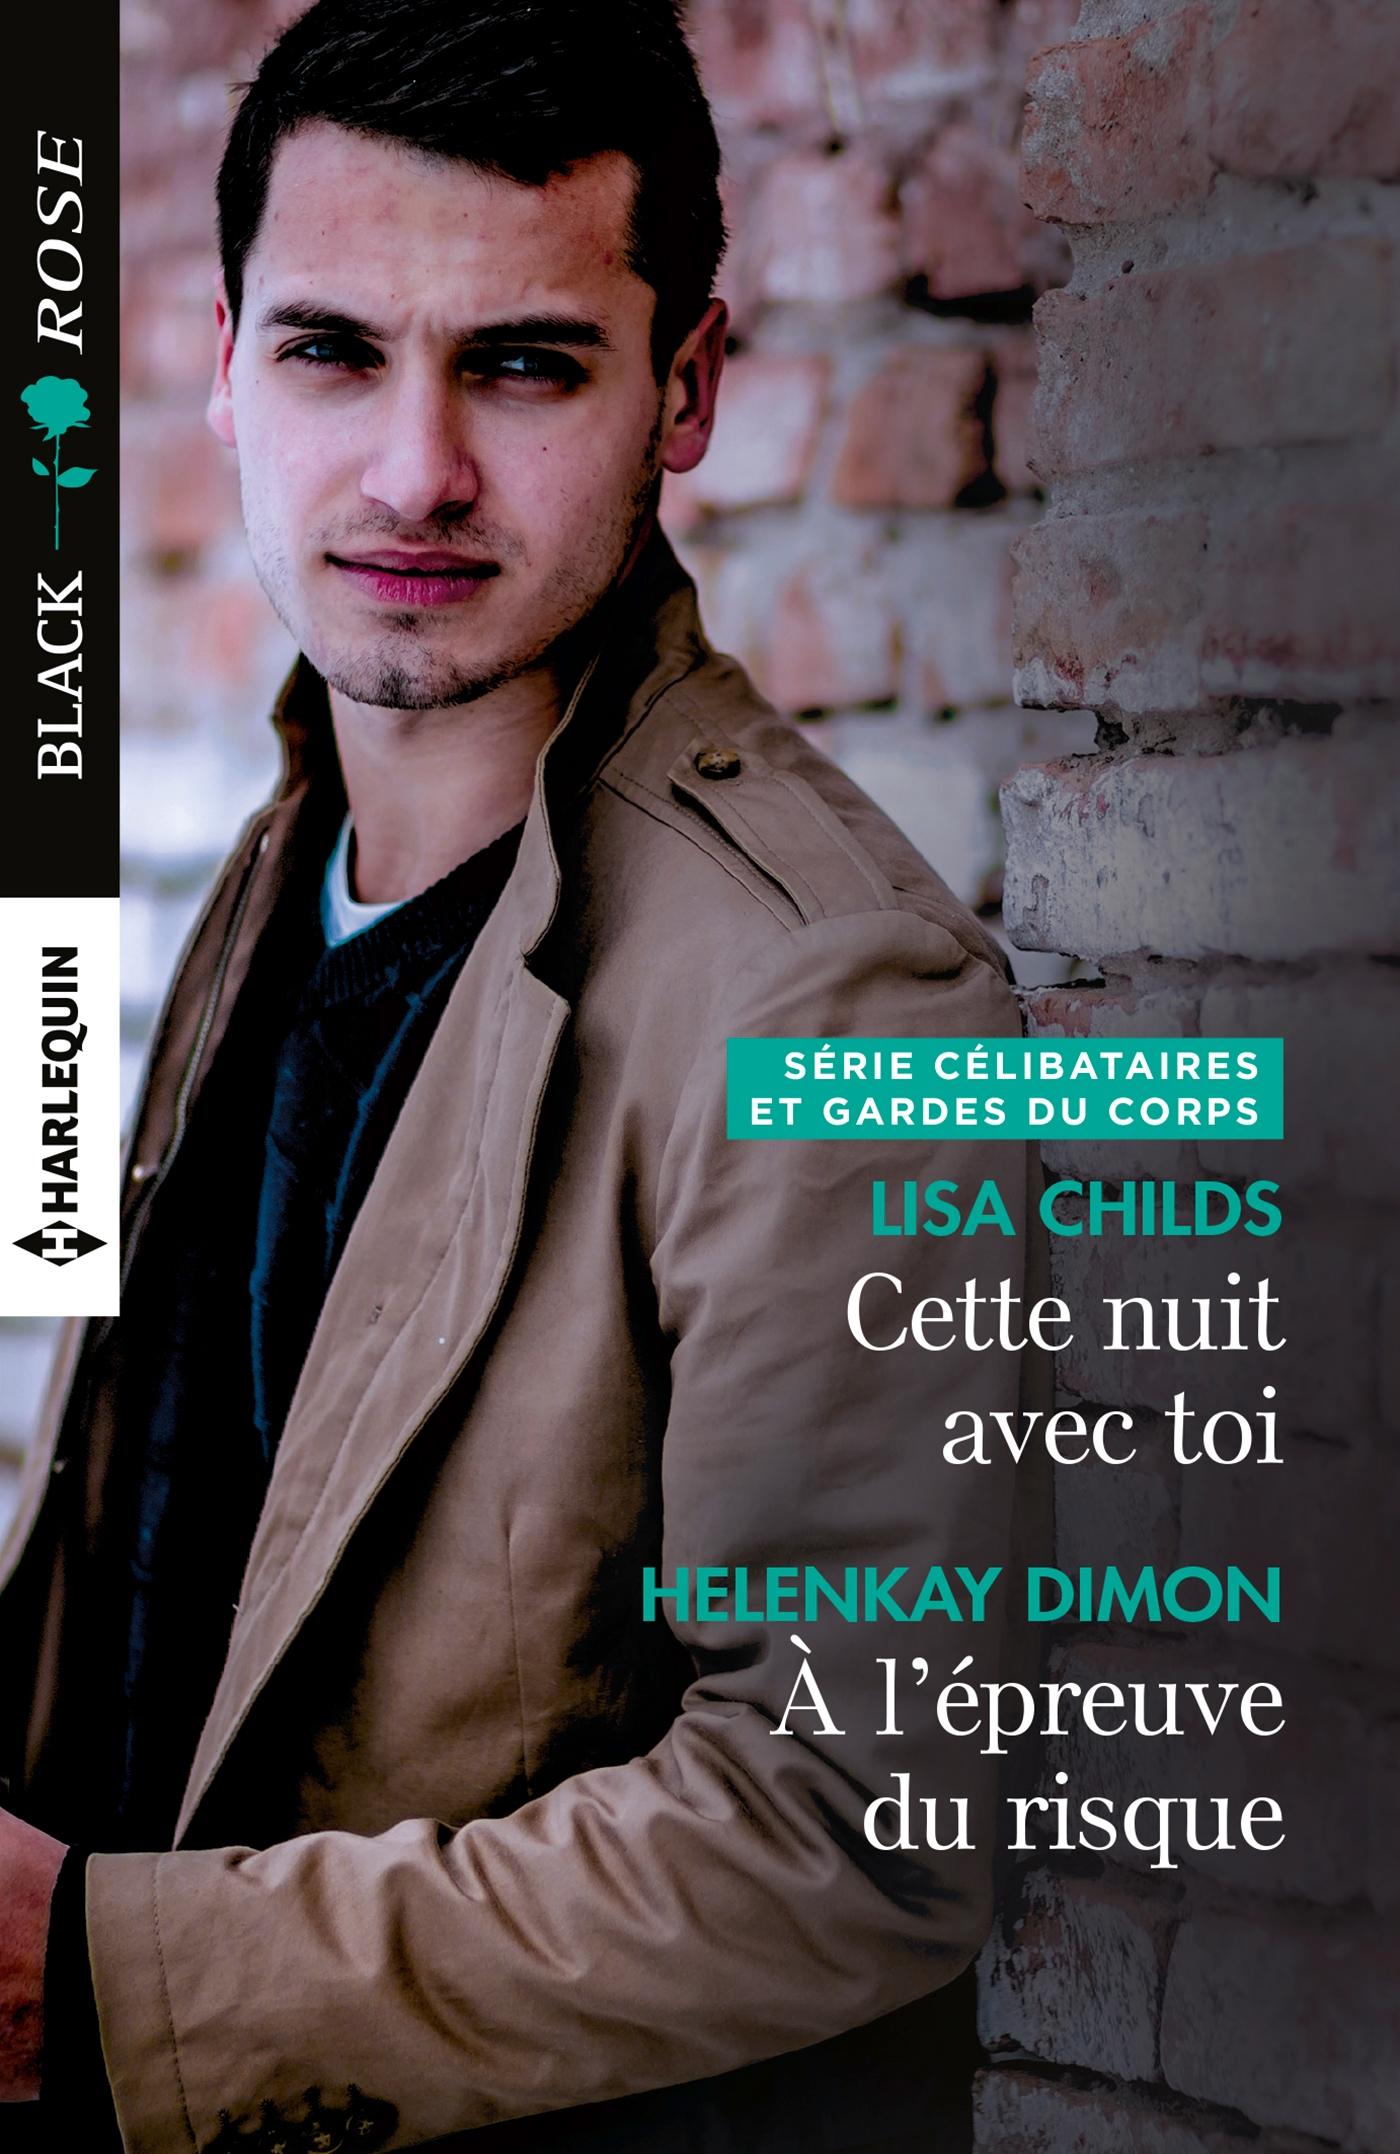 www.harlequin.fr/images/Livre-Hachette/HD/9782280363167.jpg